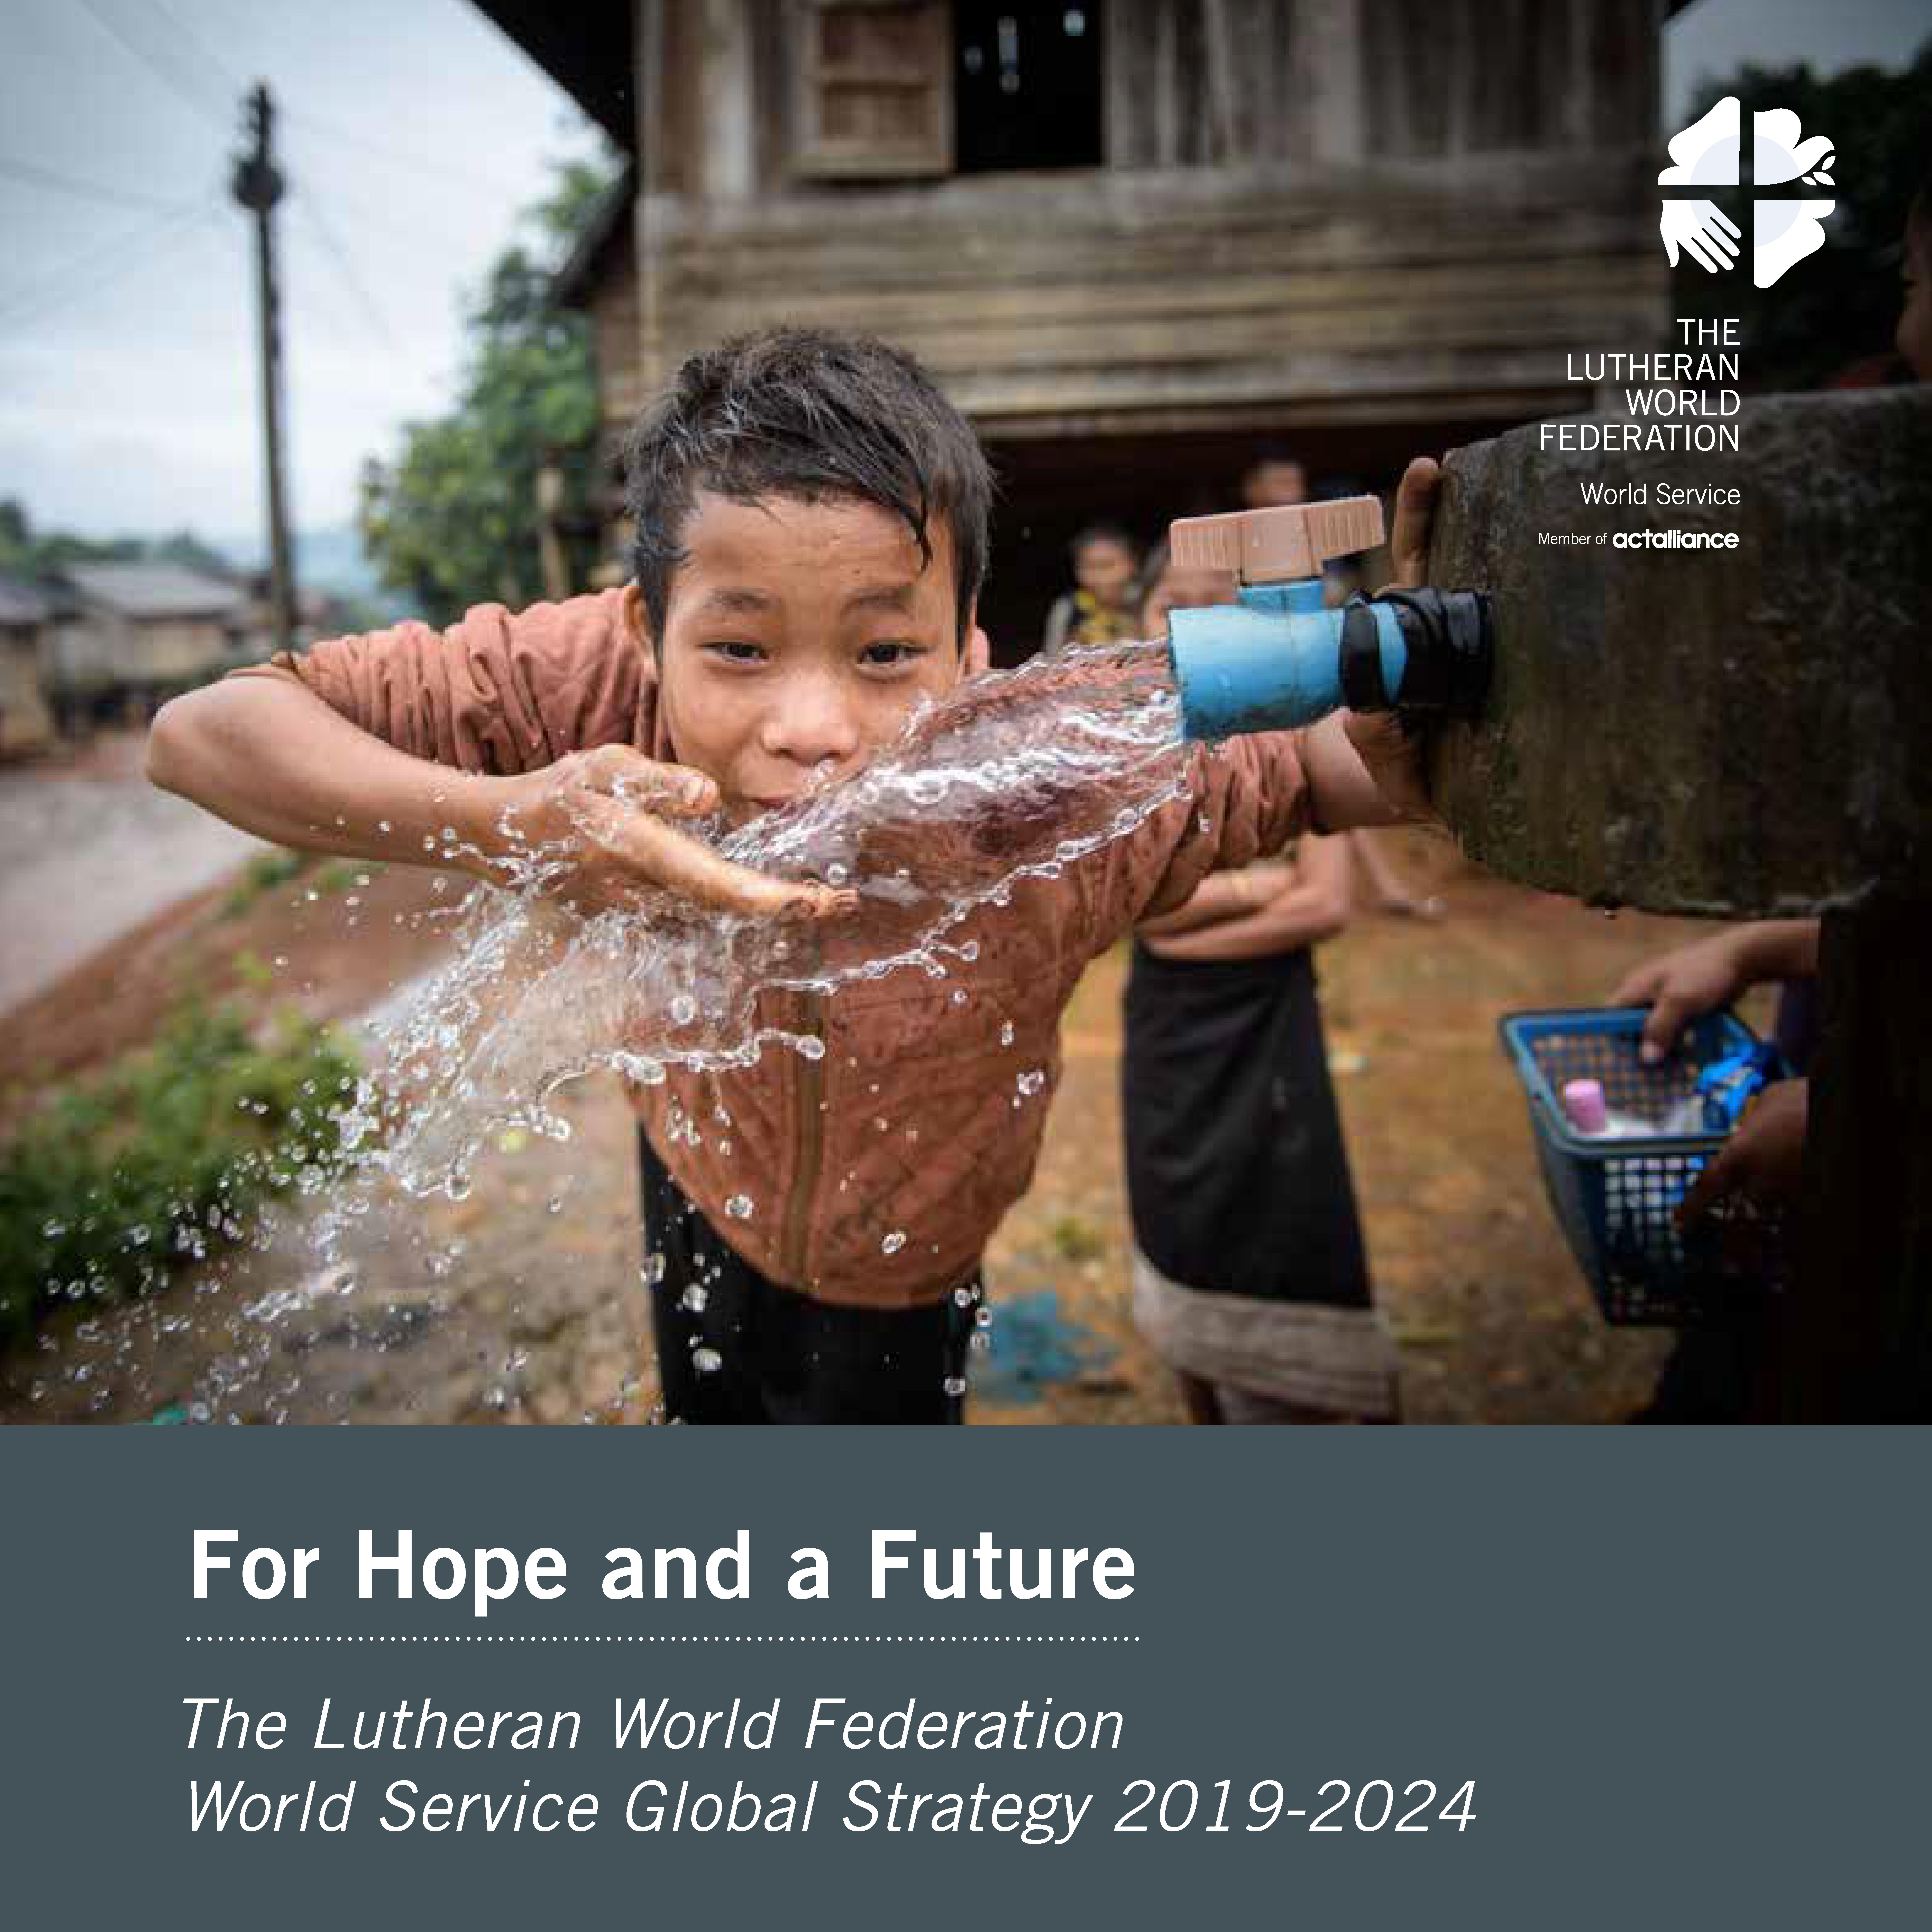 LWF World Service Global Strategy